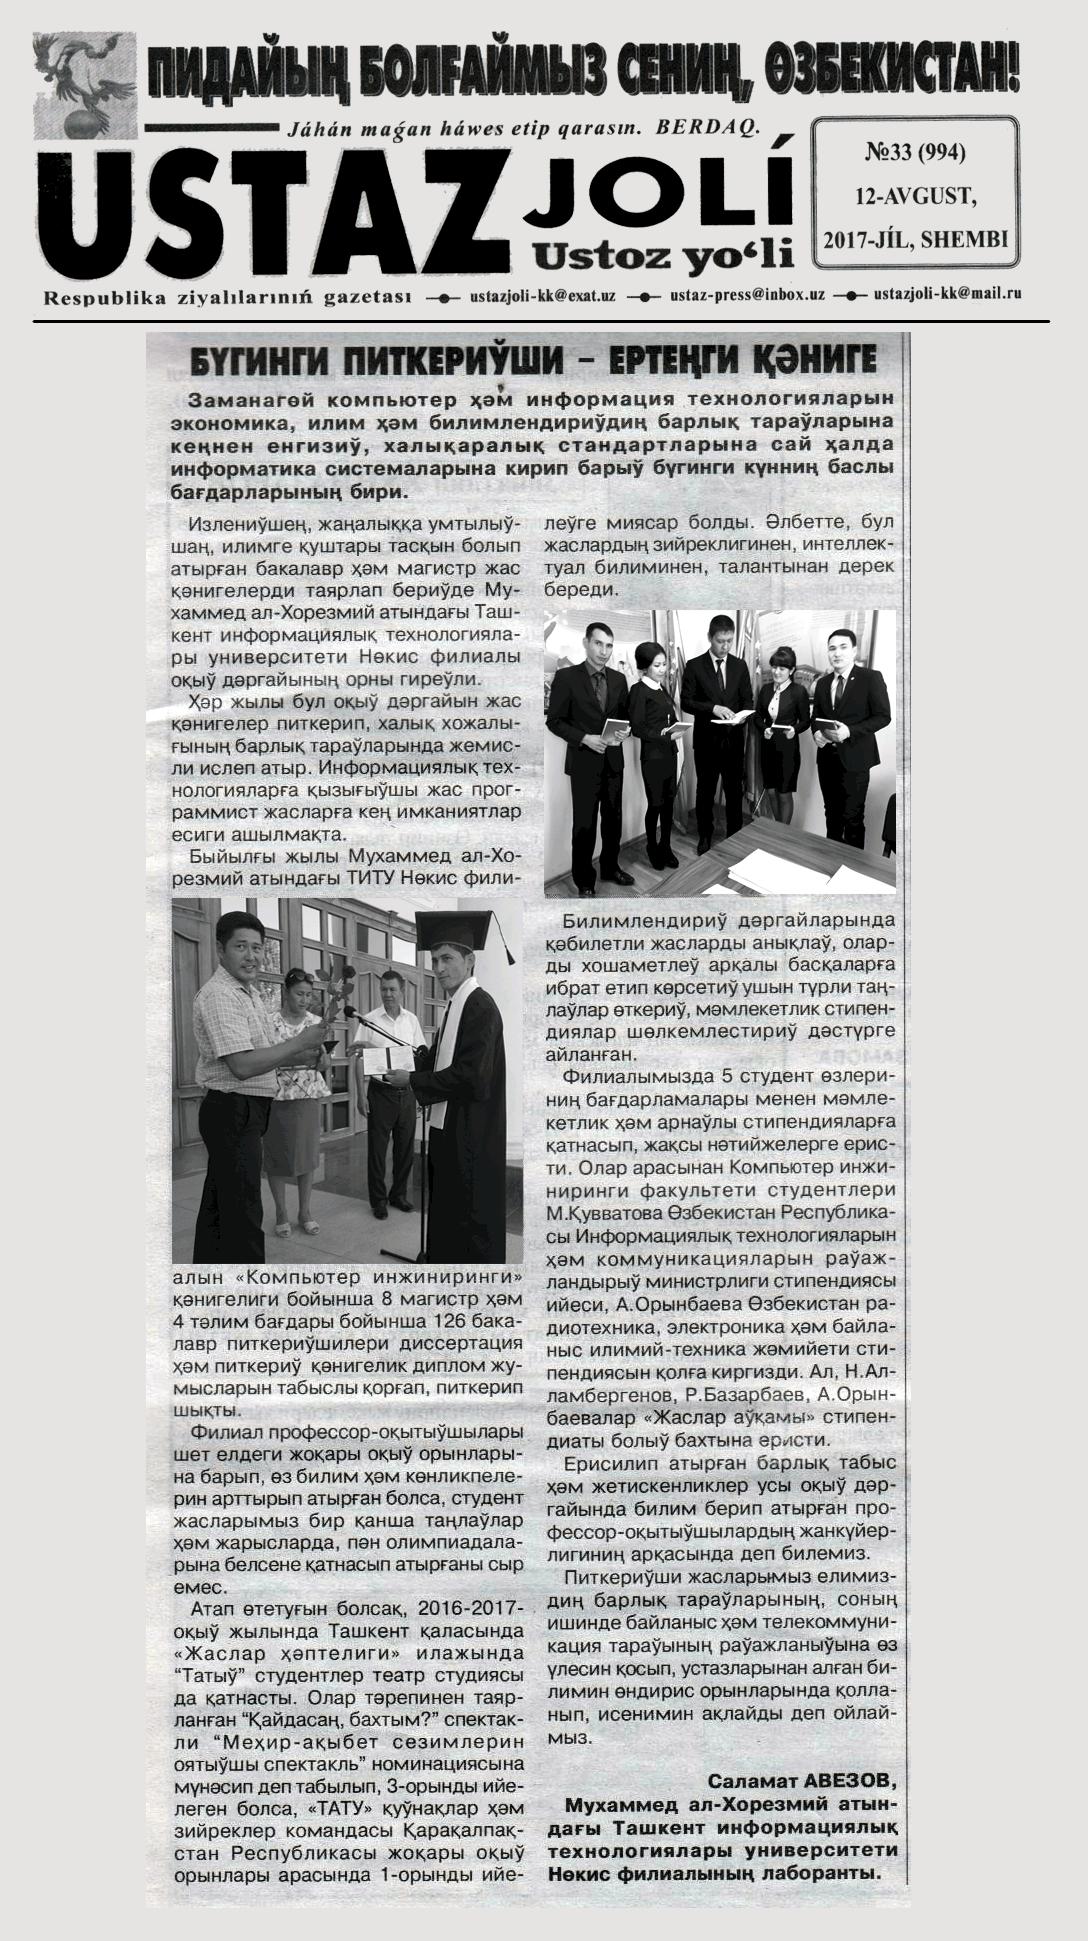 «USTAZ JOLİ Ustoz yo'li» Respublika ziyalılarının' gazetası №33 (994) 12-AVGUST, 2017-Jİl